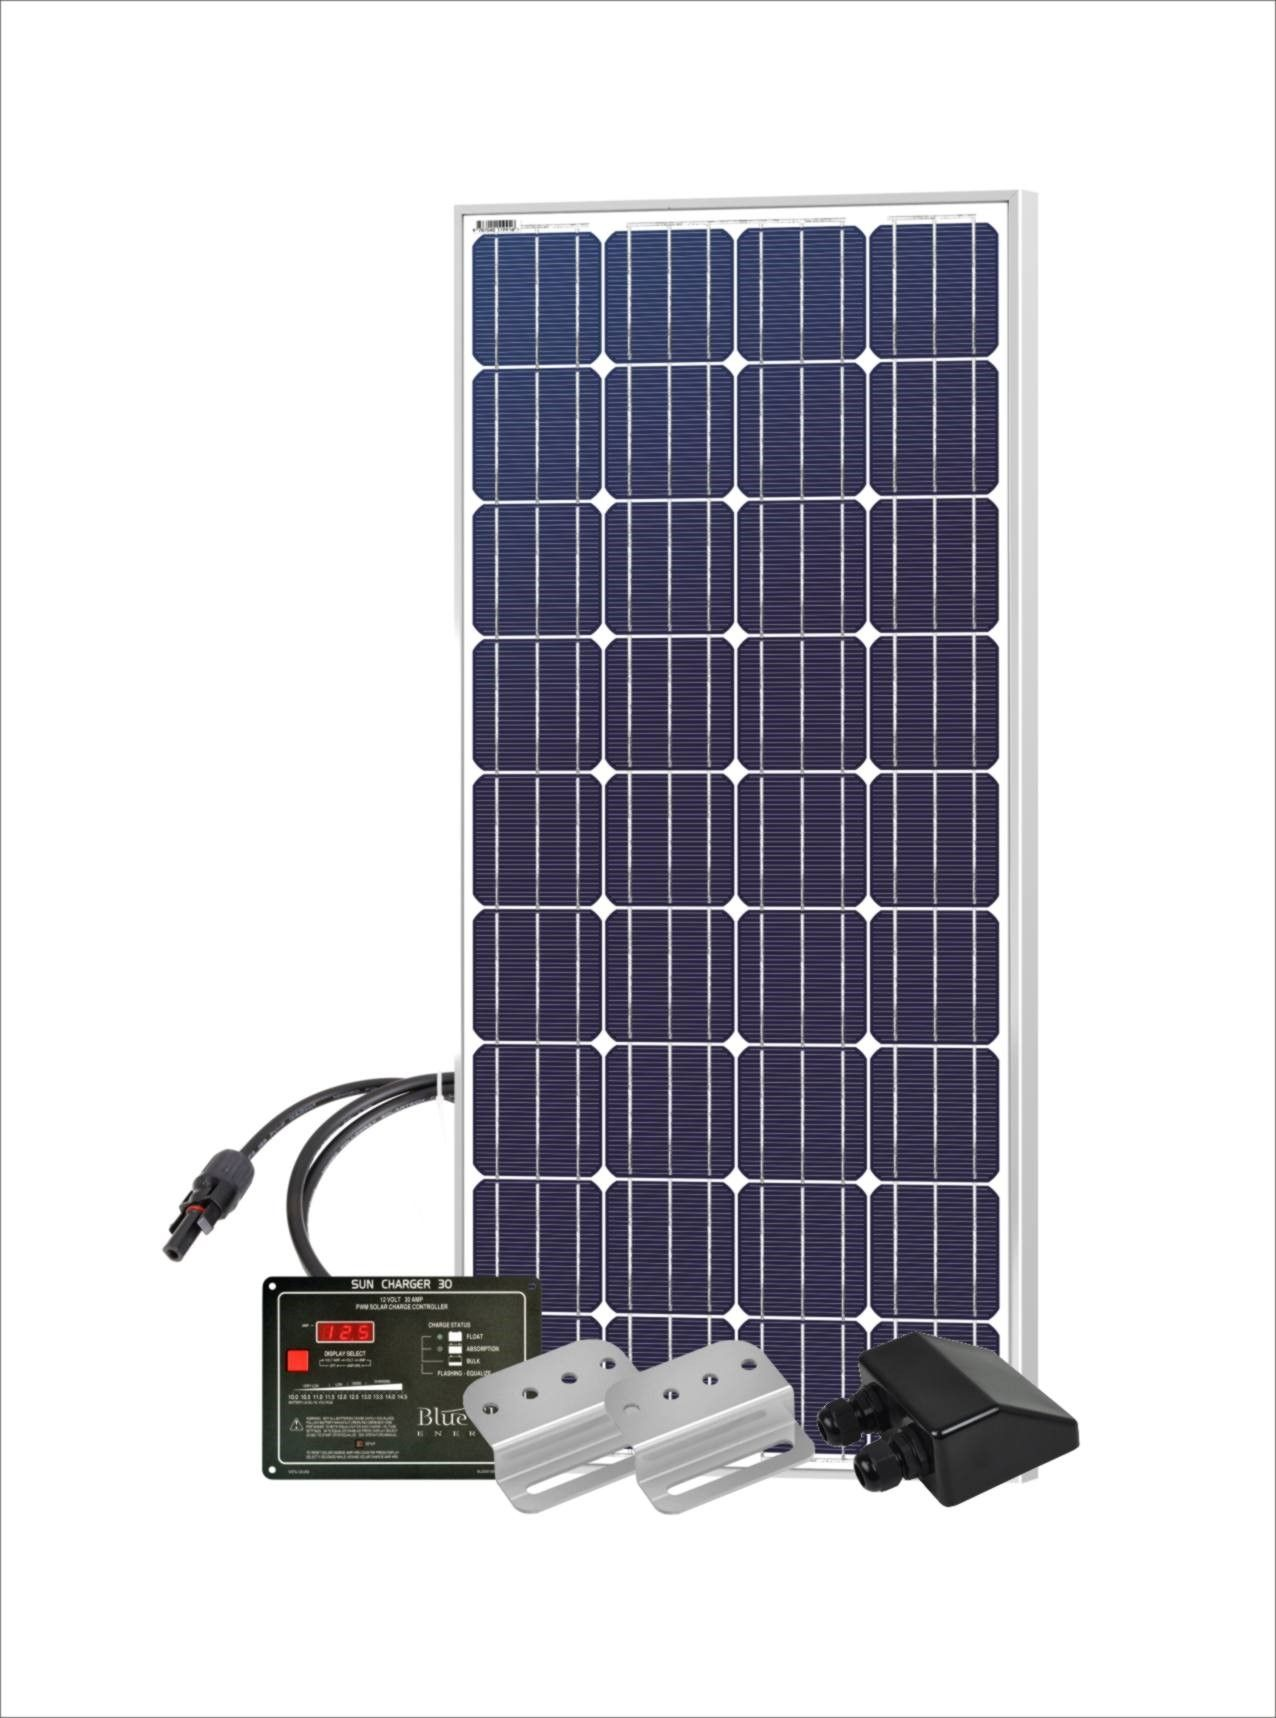 Rv Solar Panel Starter Kit Rv Solar Panels Best Solar Panels Solar Energy Panels